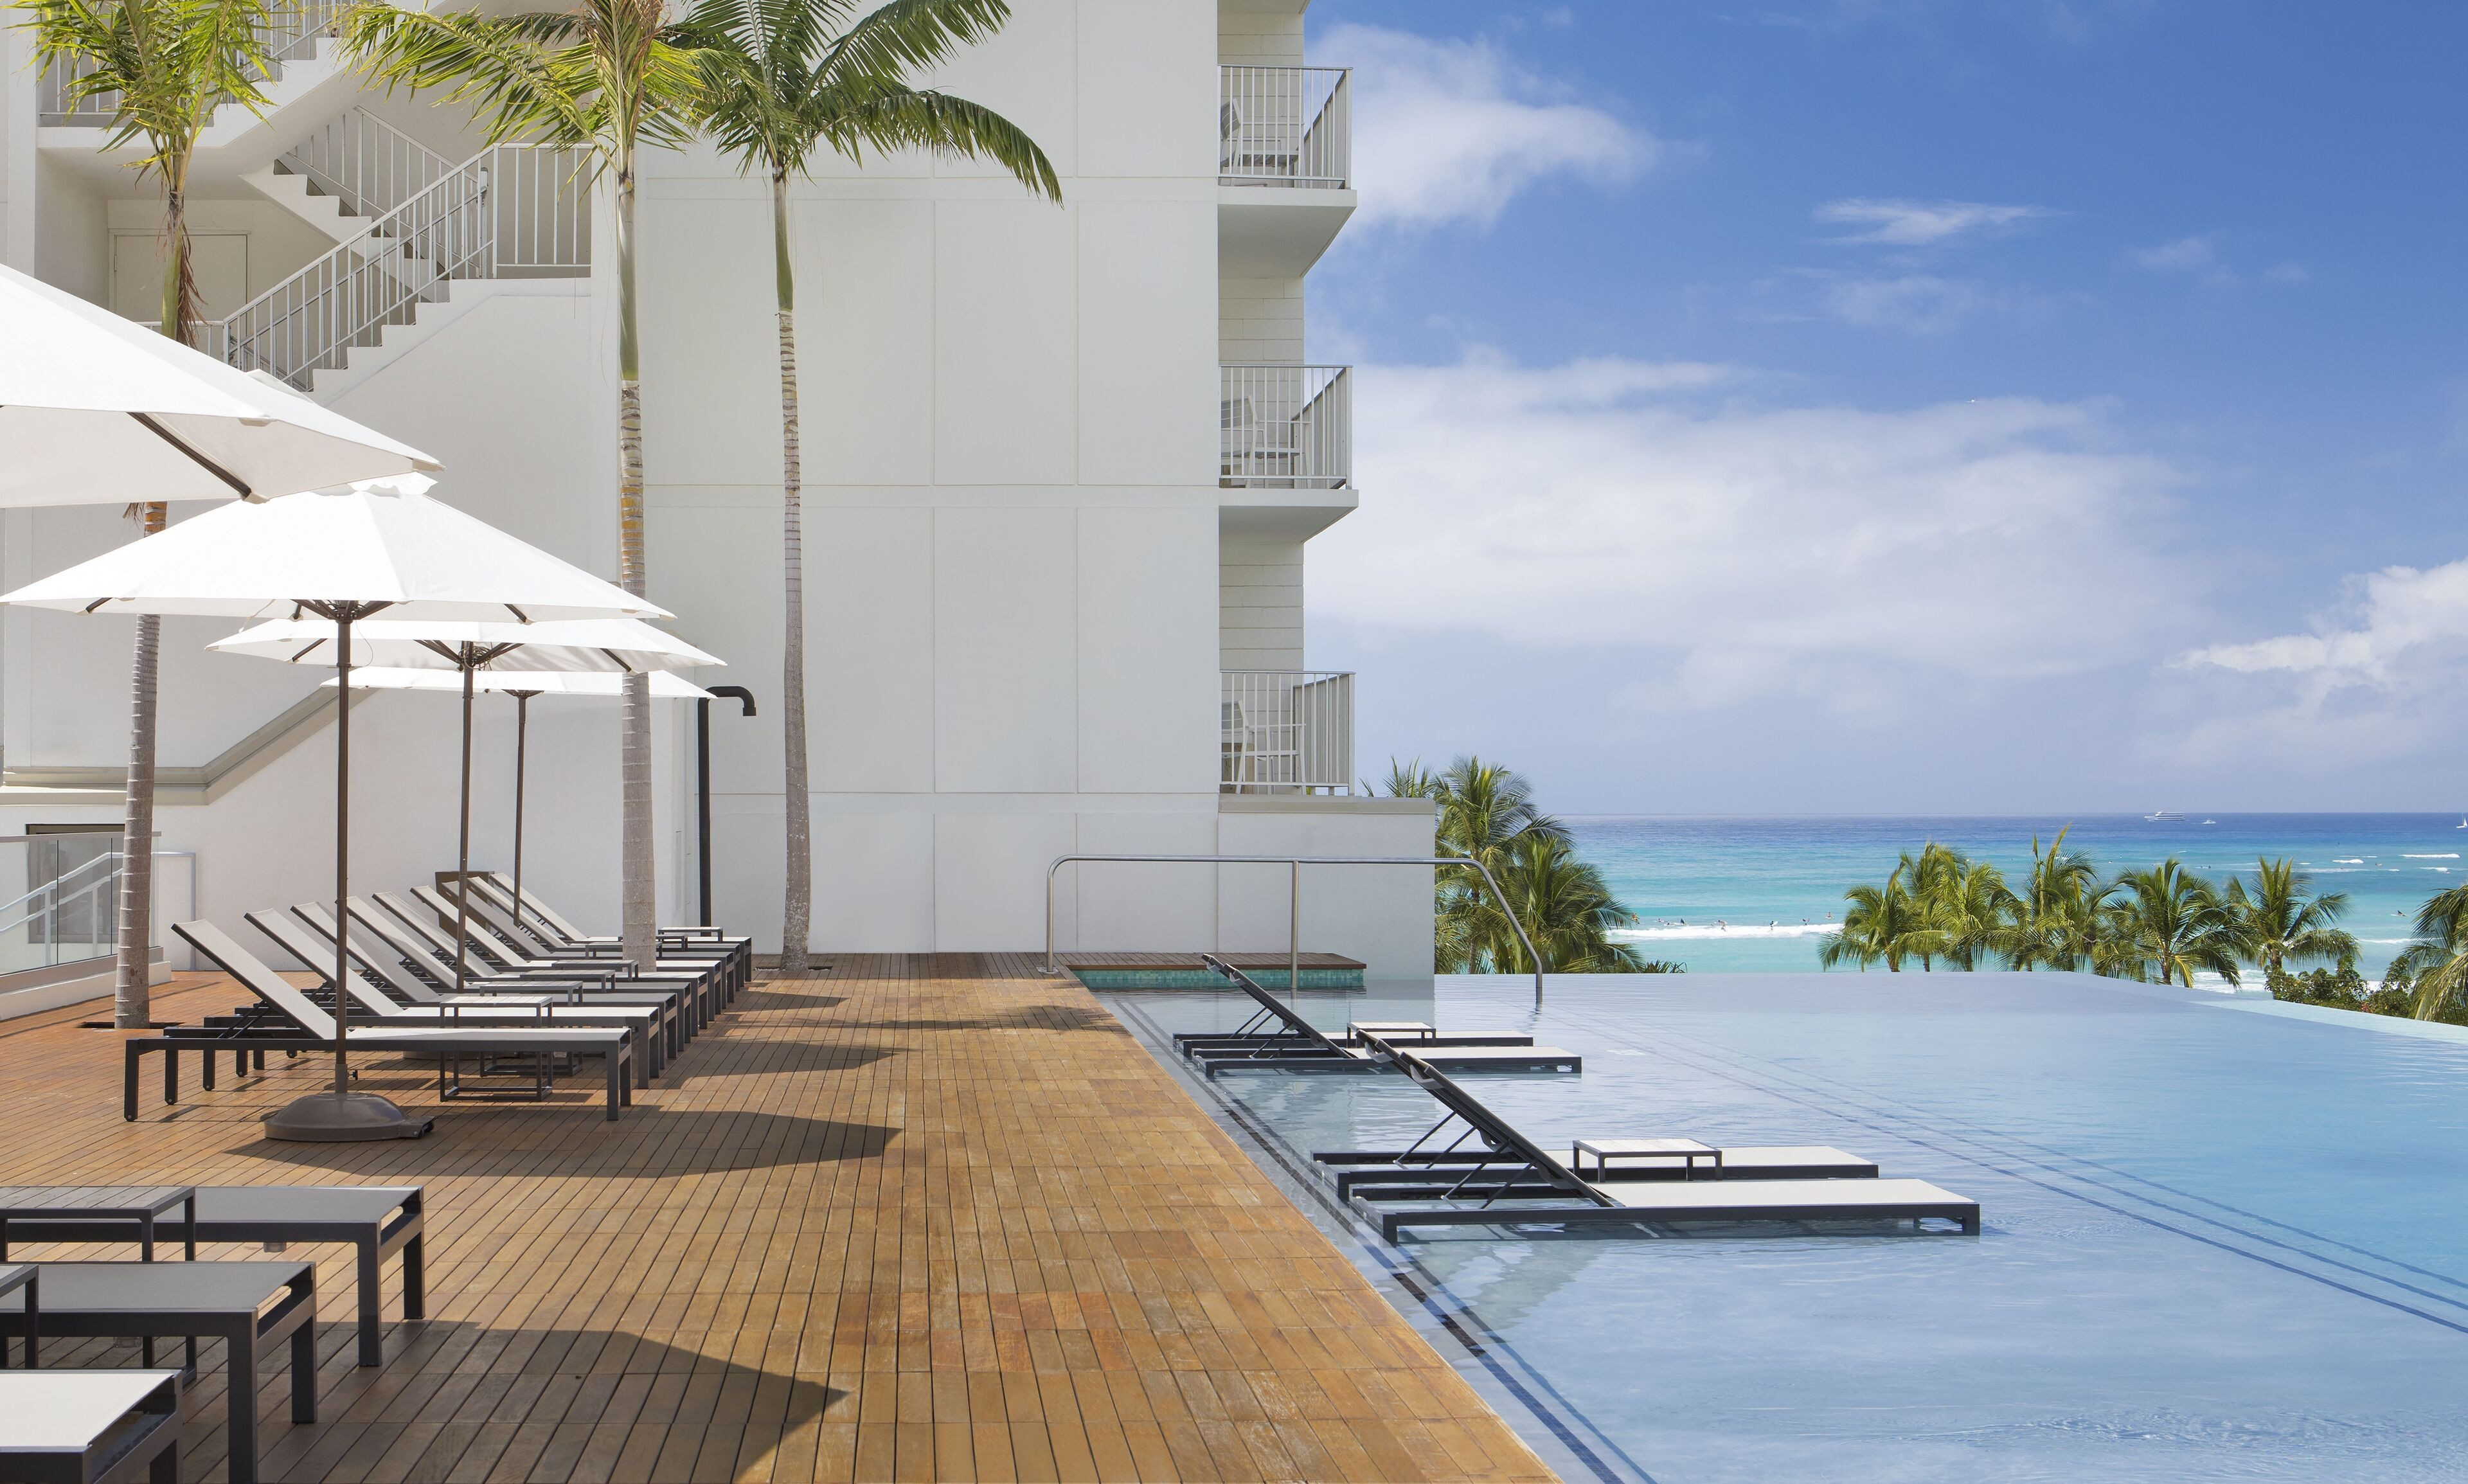 Courtesy of Alohilani Resort Waikiki Beach / Expedia